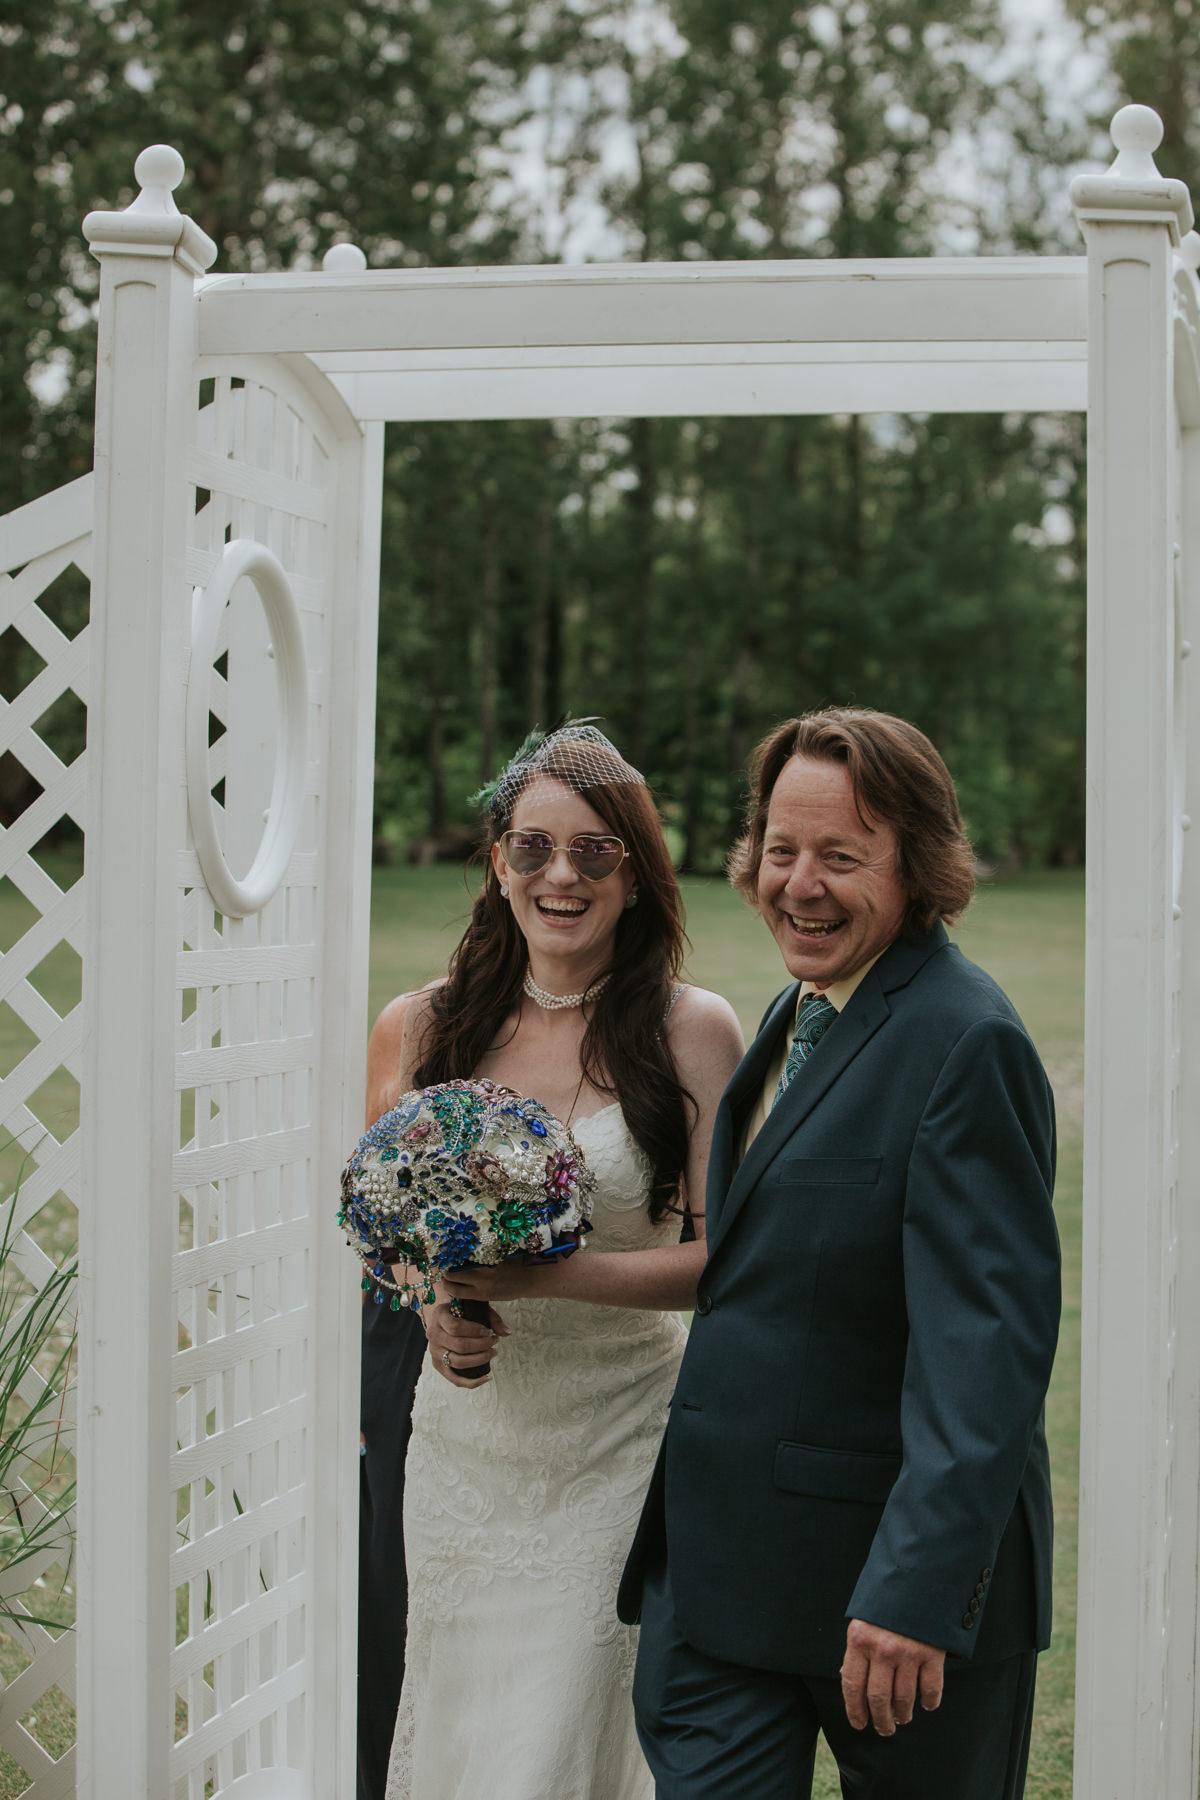 Vancouver Wedding Photographer Pam (23).jpg